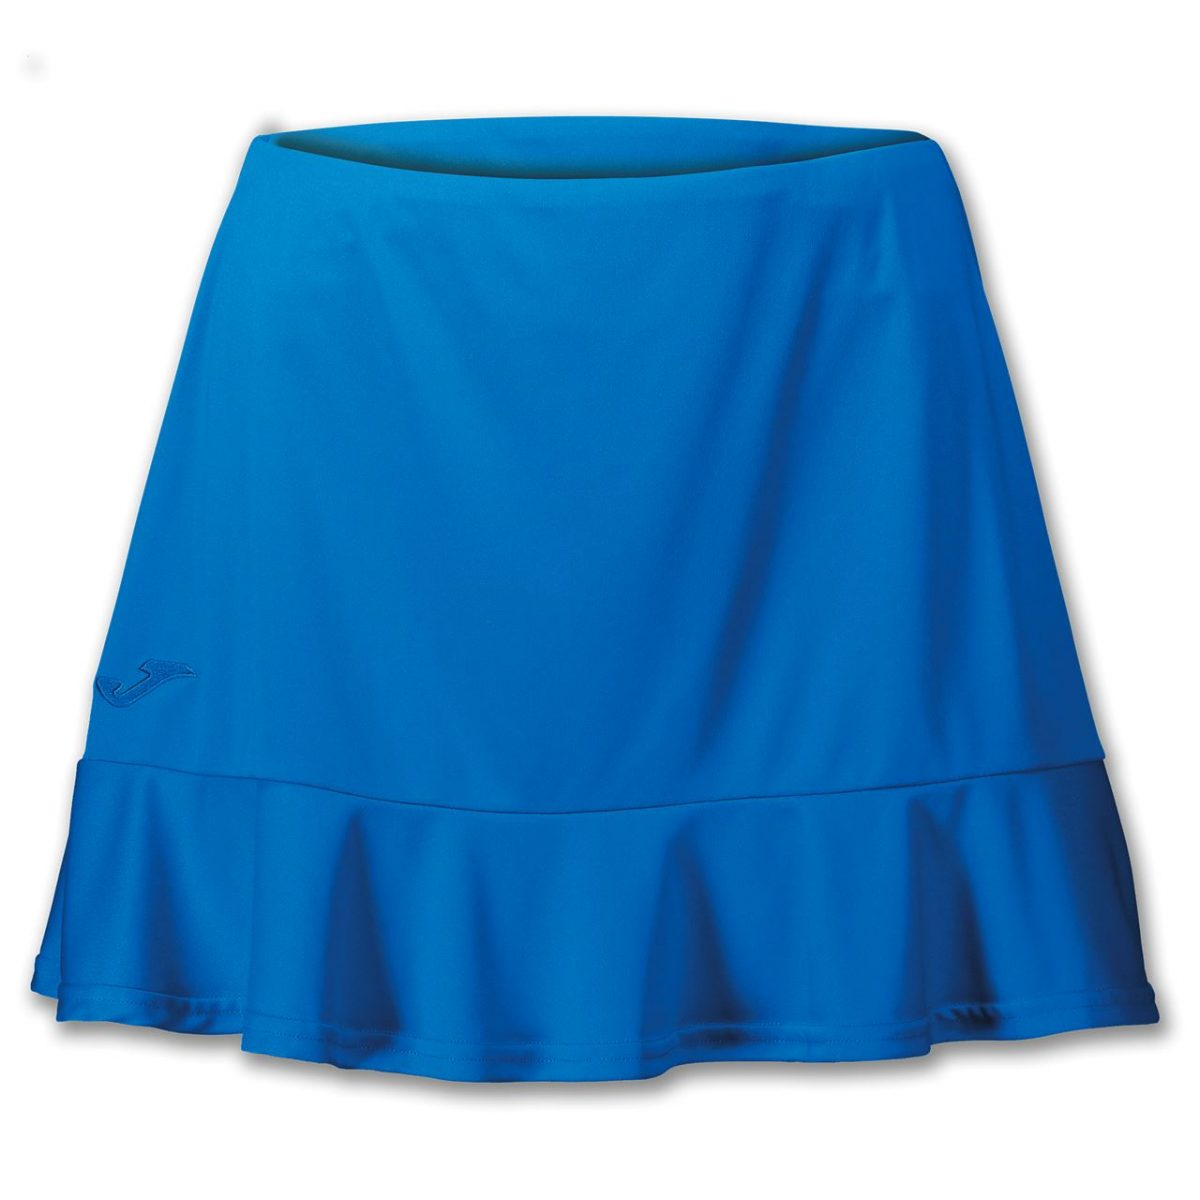 Joma Torneo II Skirt Woman Adult 900461